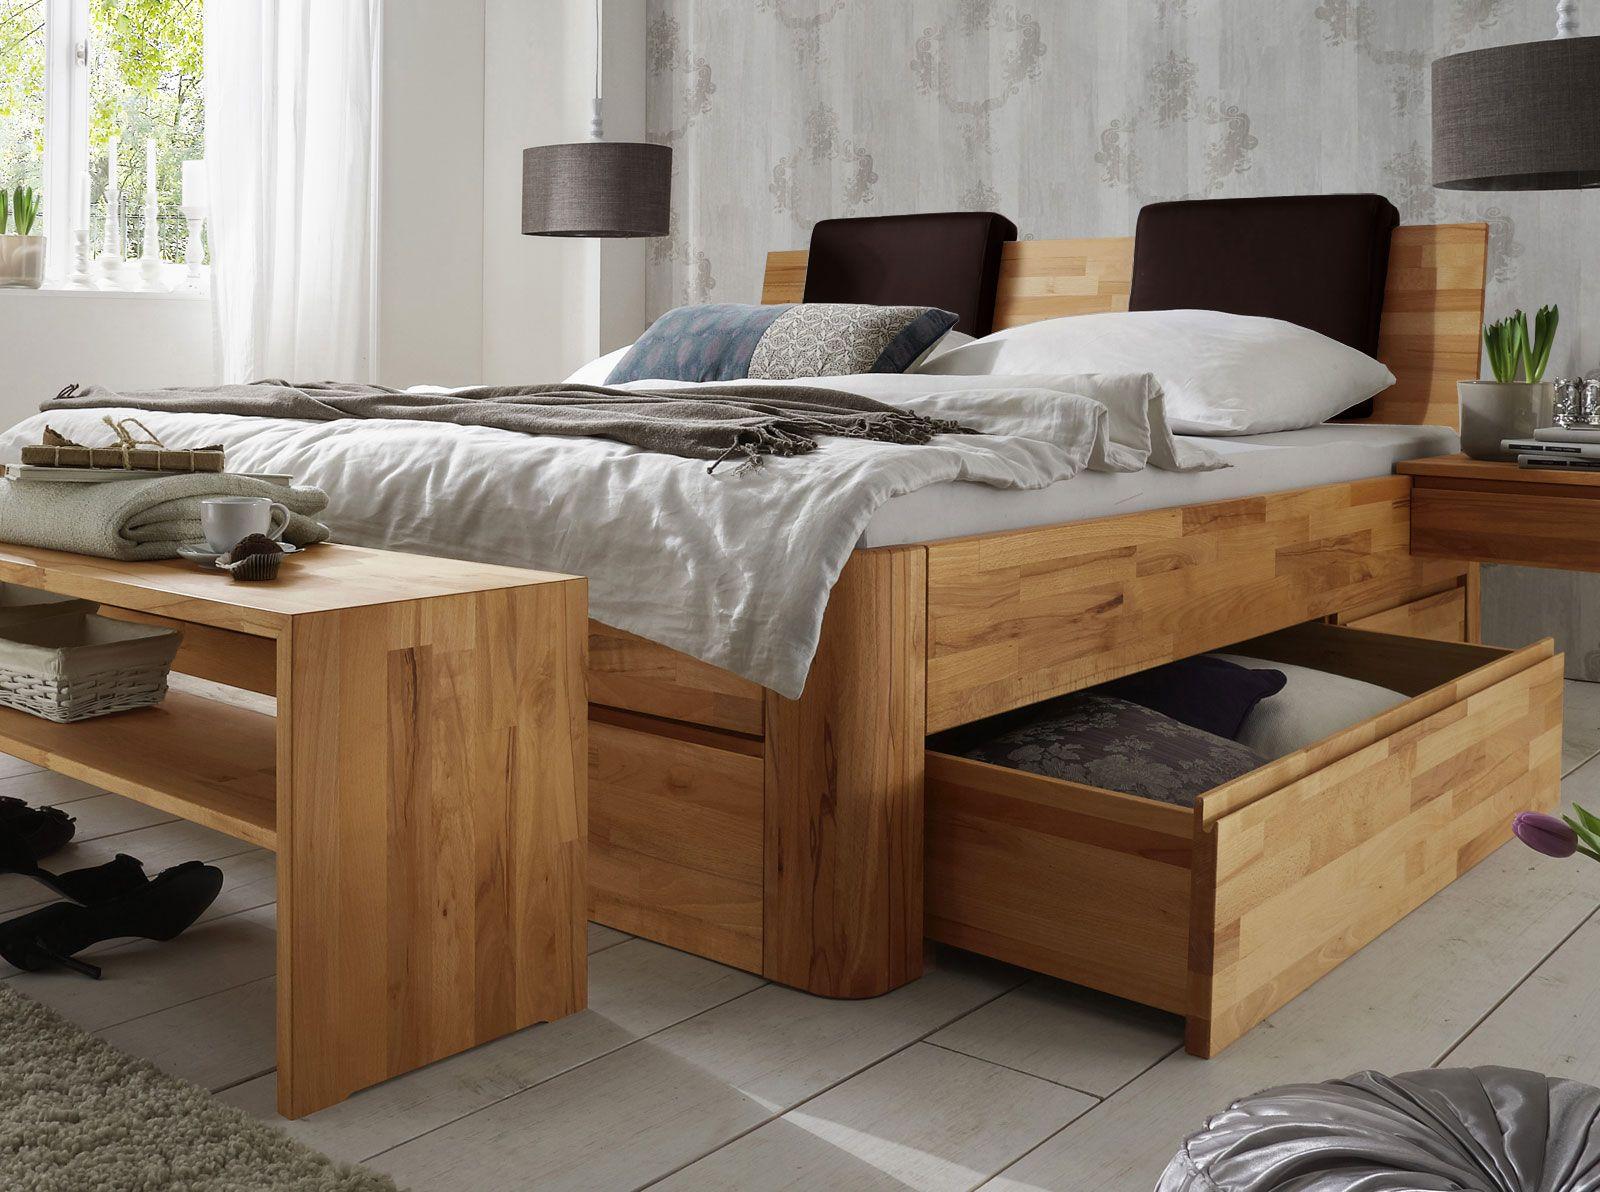 schubkasten doppelbett zarbo m bel pinterest dunkelbraun kunstleder und bett. Black Bedroom Furniture Sets. Home Design Ideas